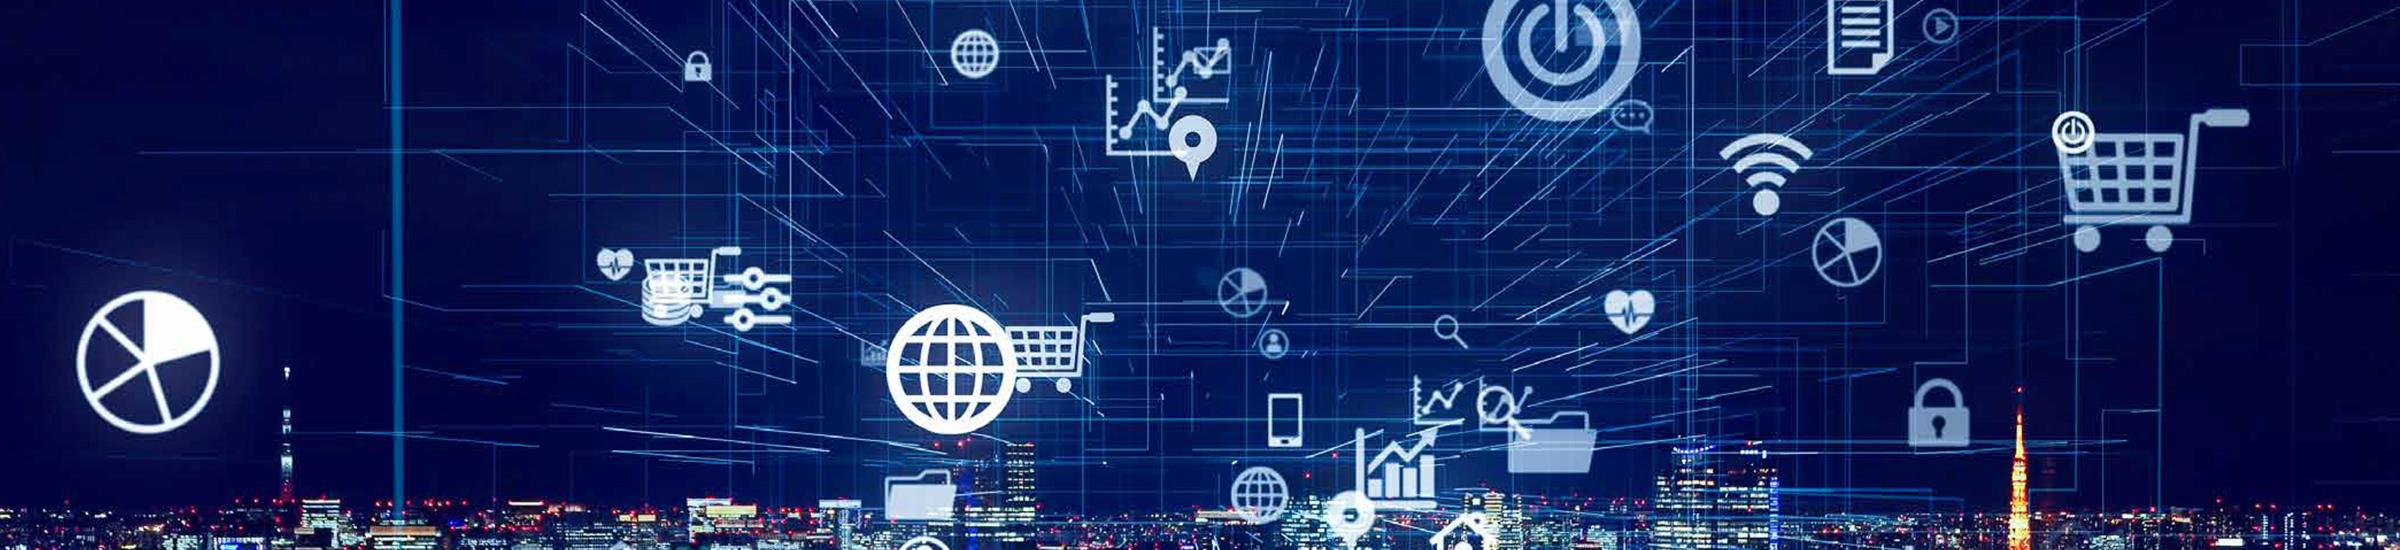 supplier-risk-and-performance-datasheet-pardot-banner